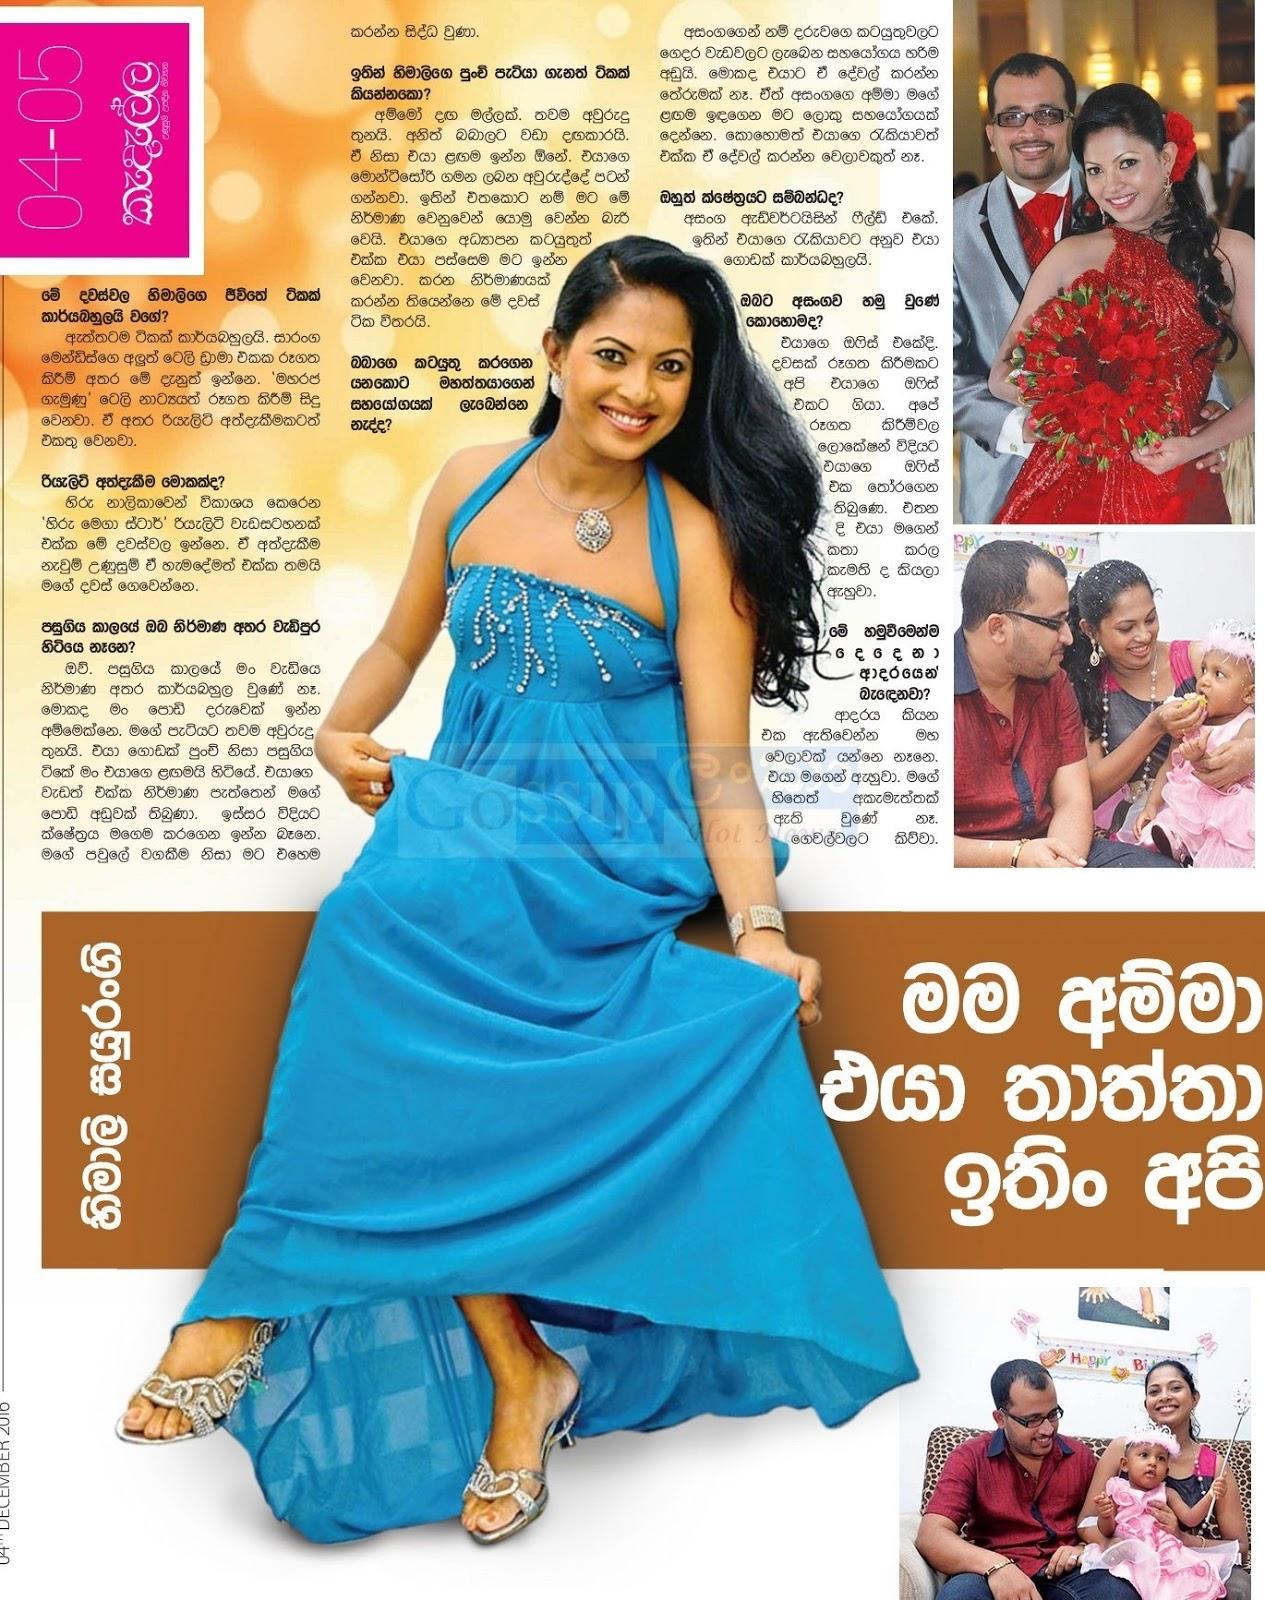 Gossip Chat with Himali Sayurangi - Gossip Lanka News